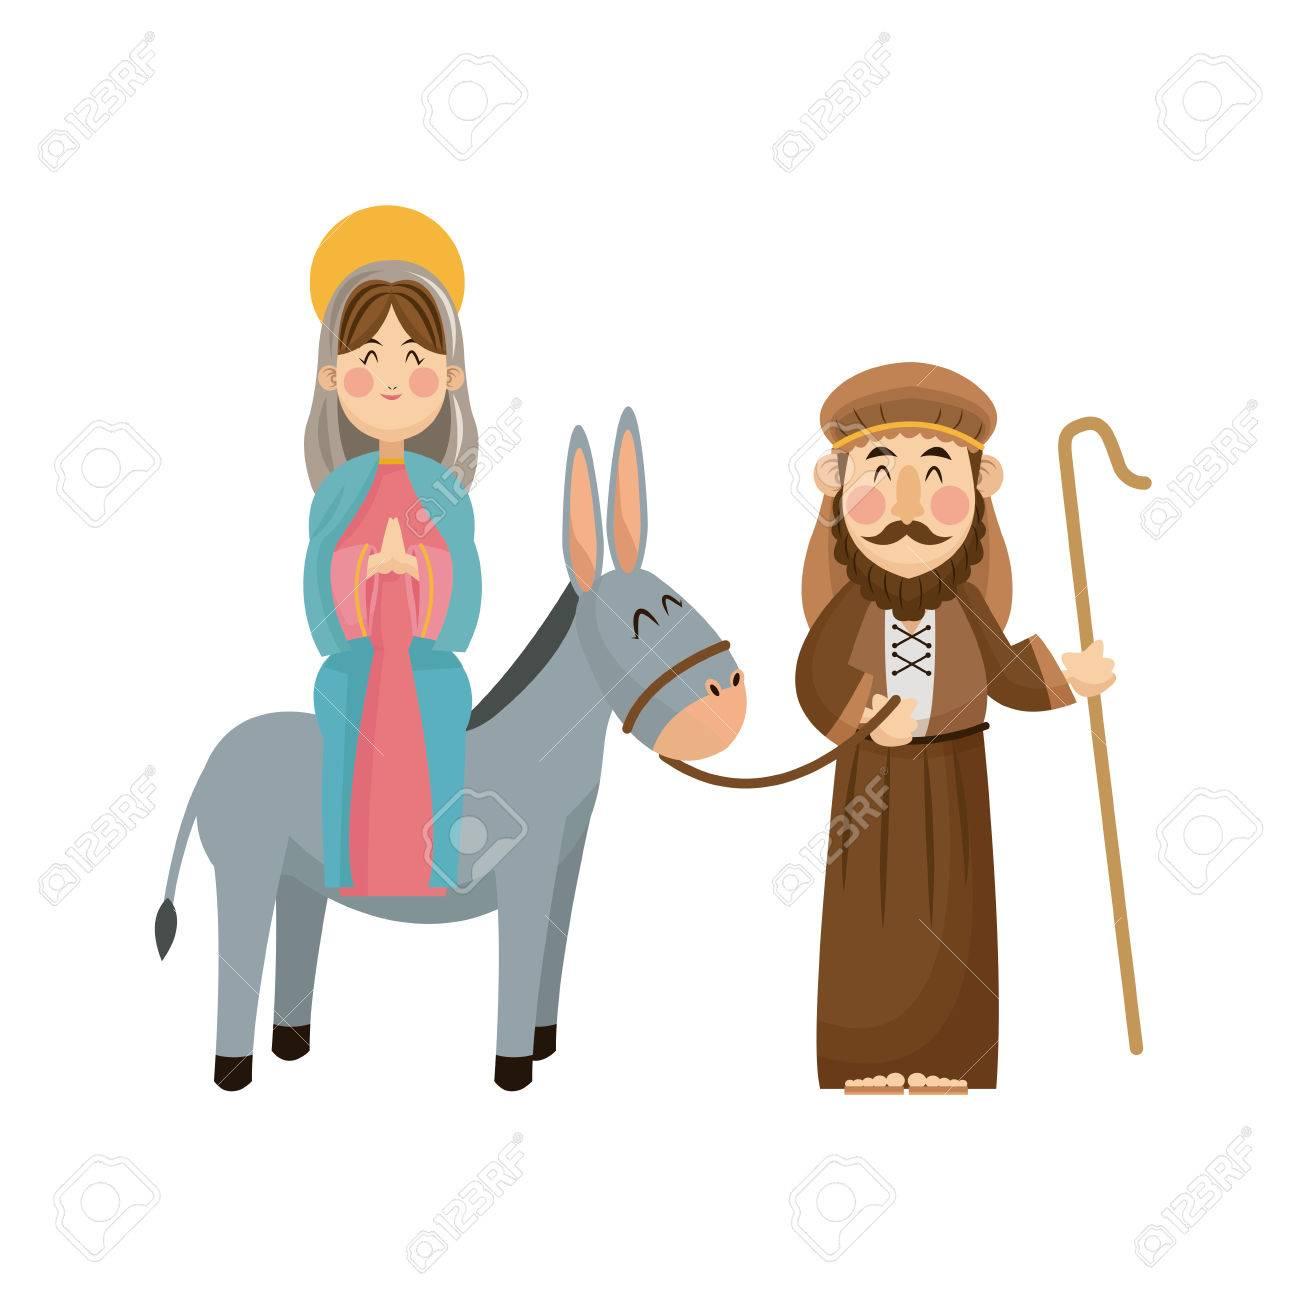 Virgin mary joseph donkey scene nativity vector illlustration.